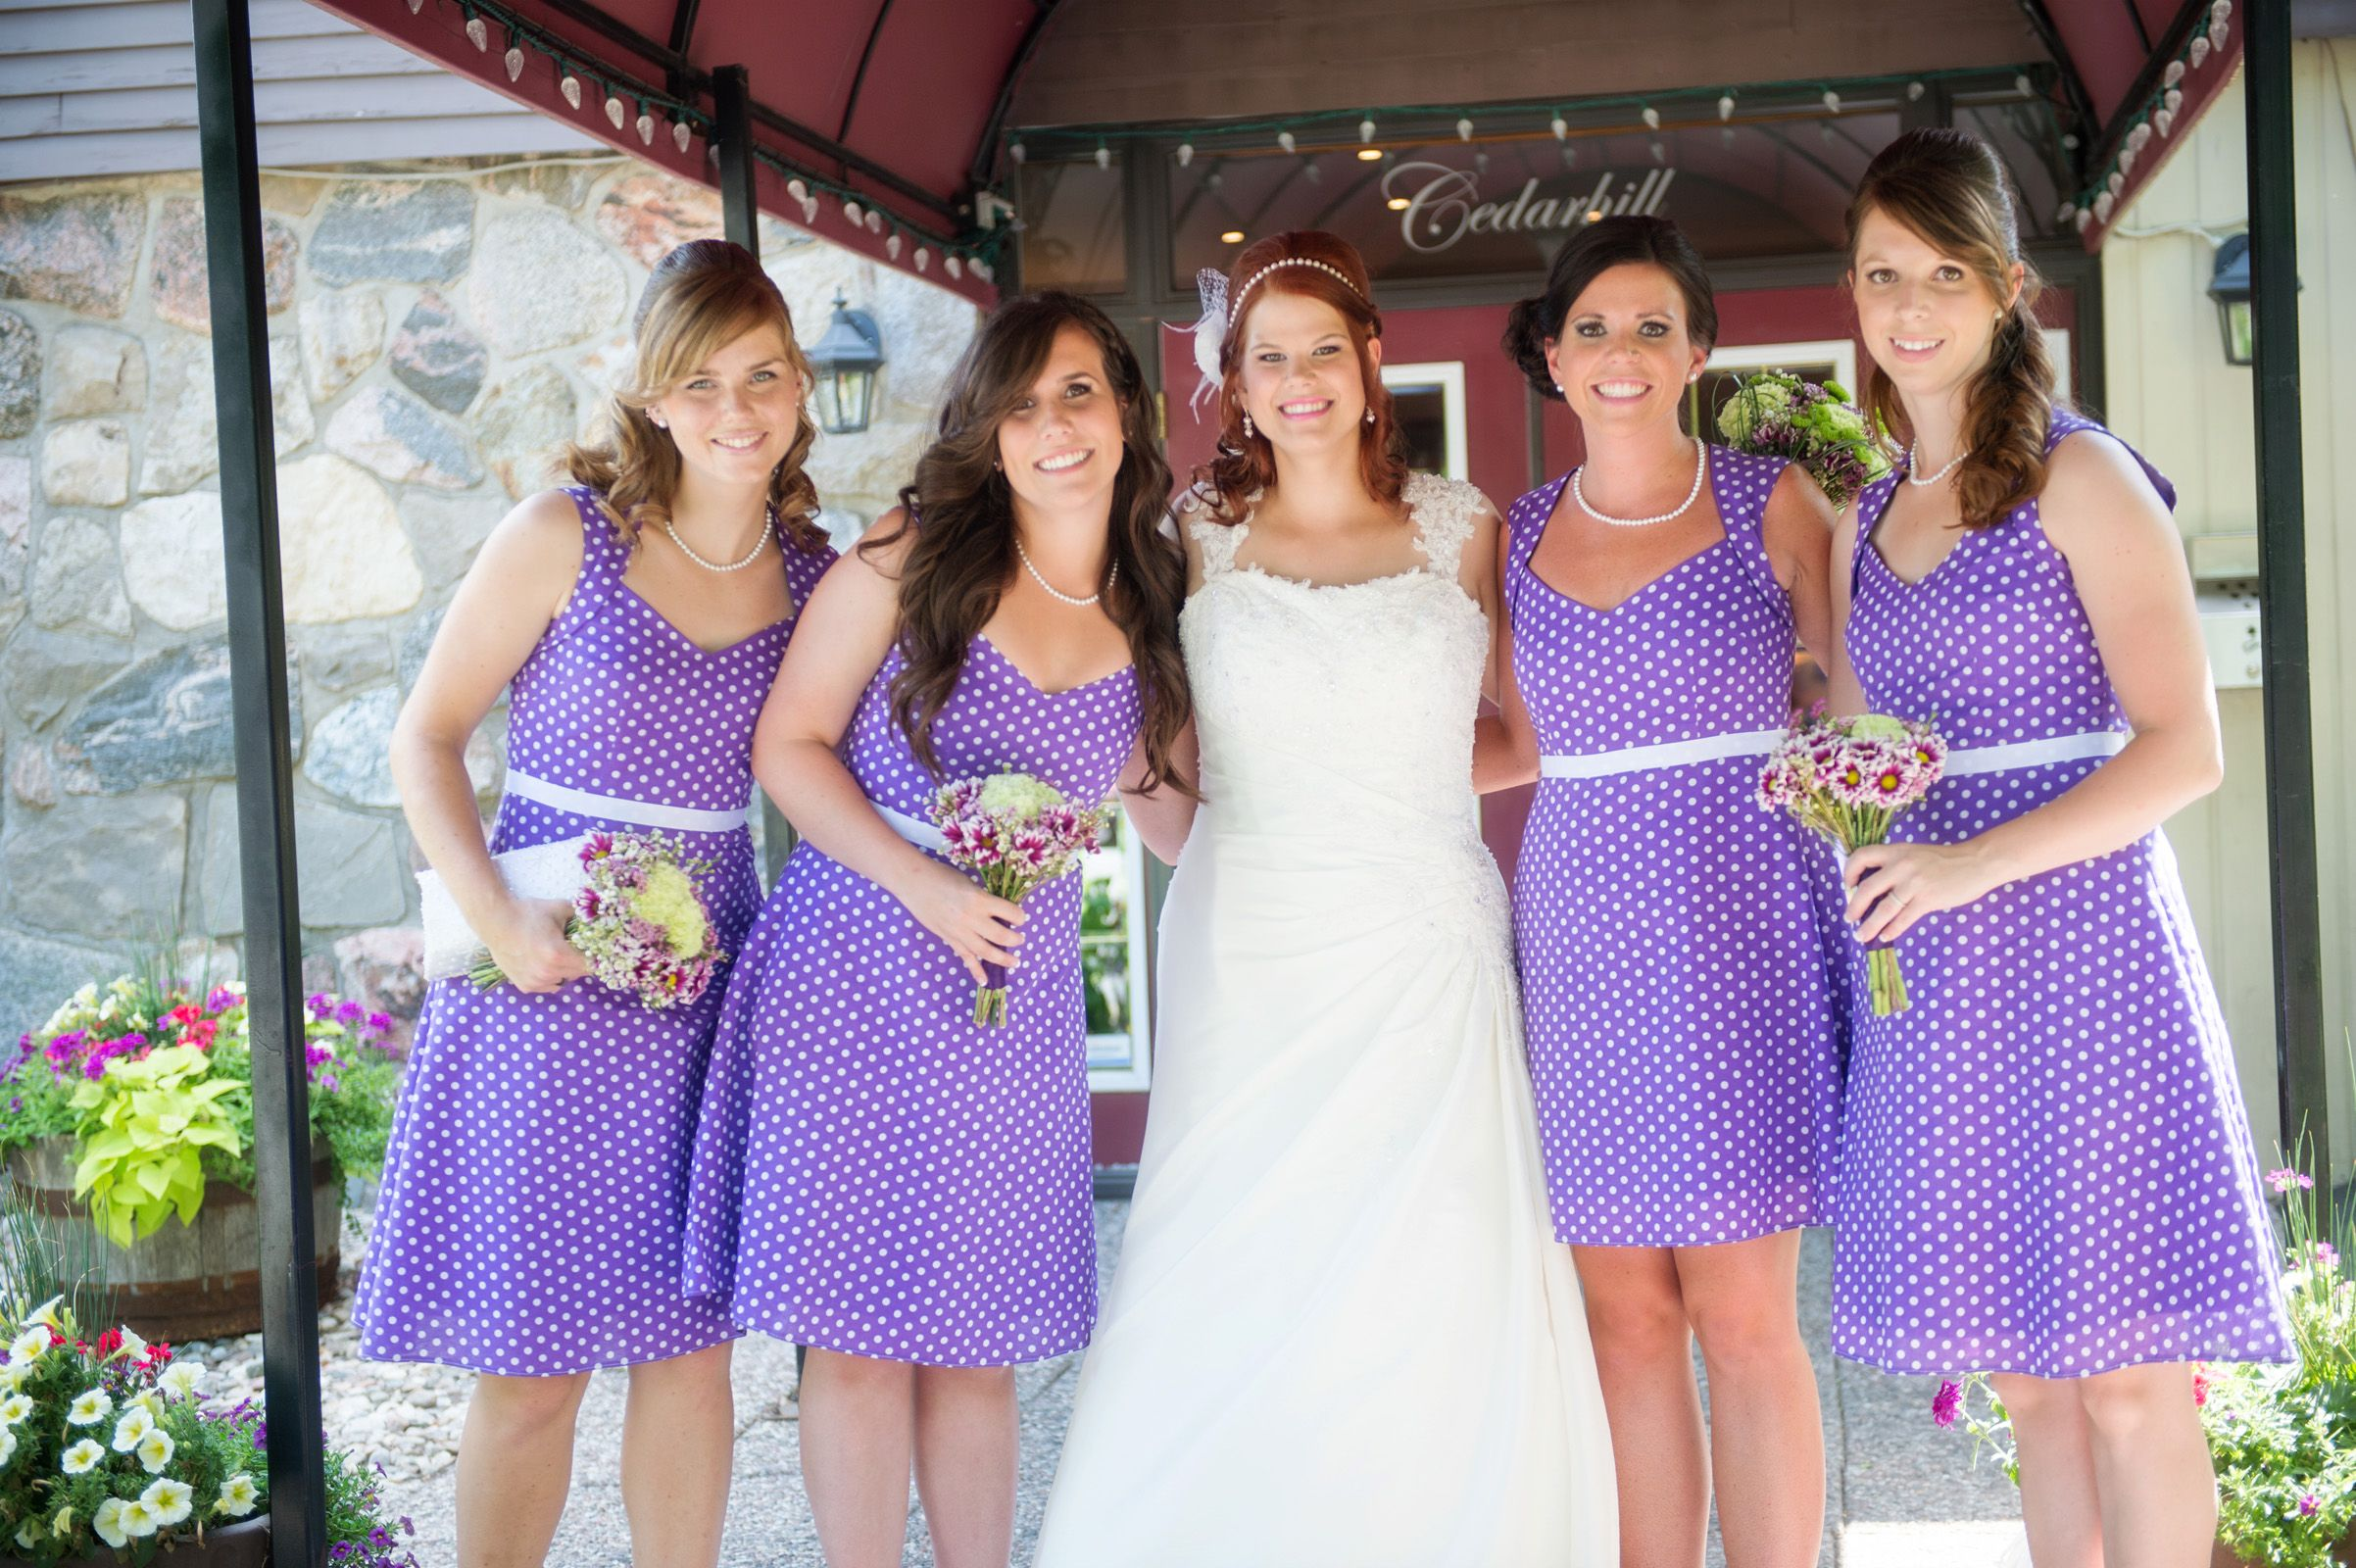 Natasha dresses with circular skirts in purple and white polka dots ...